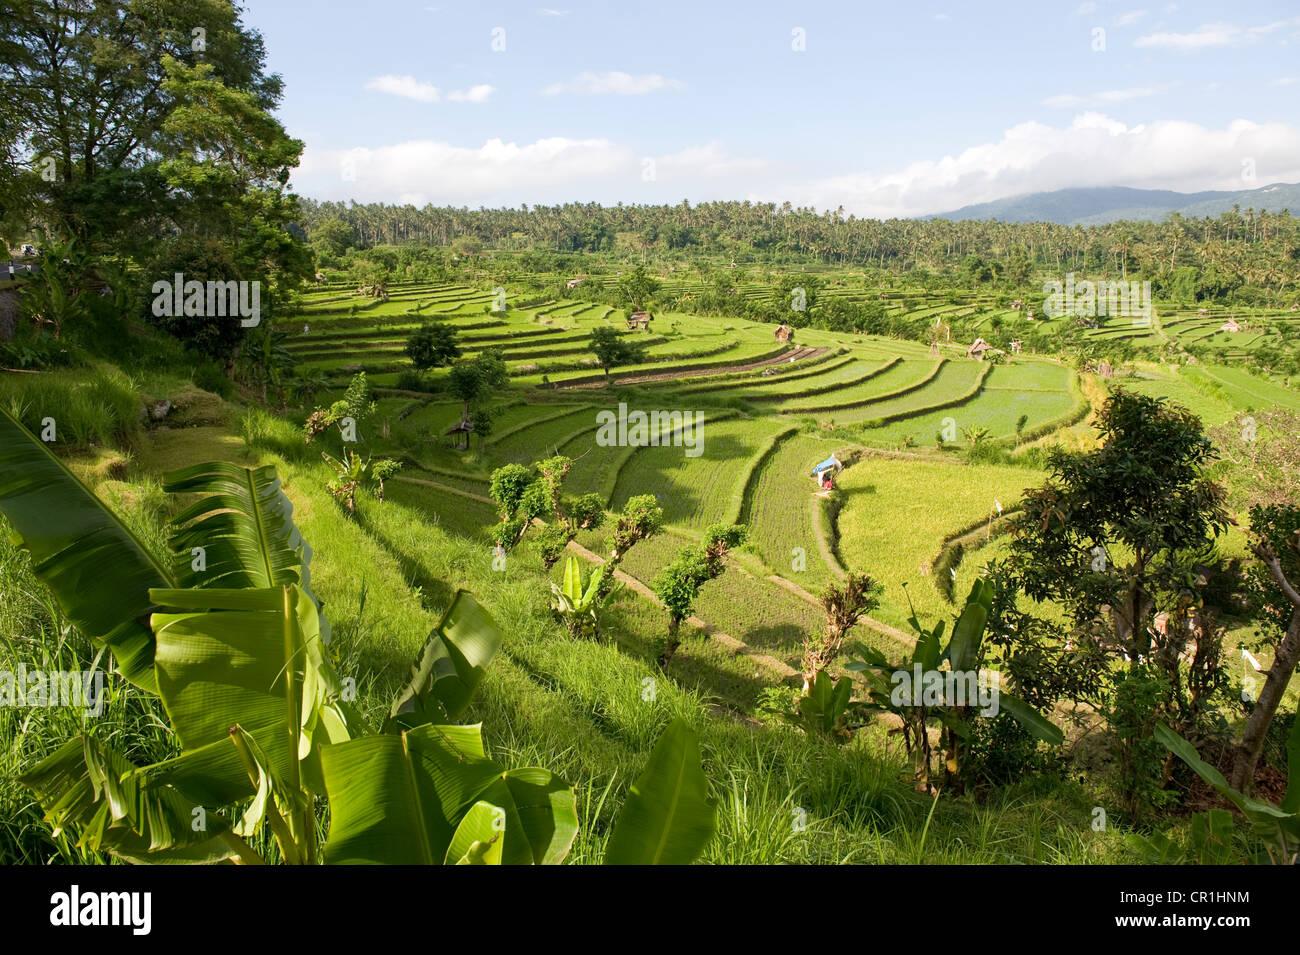 Indonesia, Bali, Subak irrigation system, UNESCO World Heritage, rice fields of Tirtagangga - Stock Image